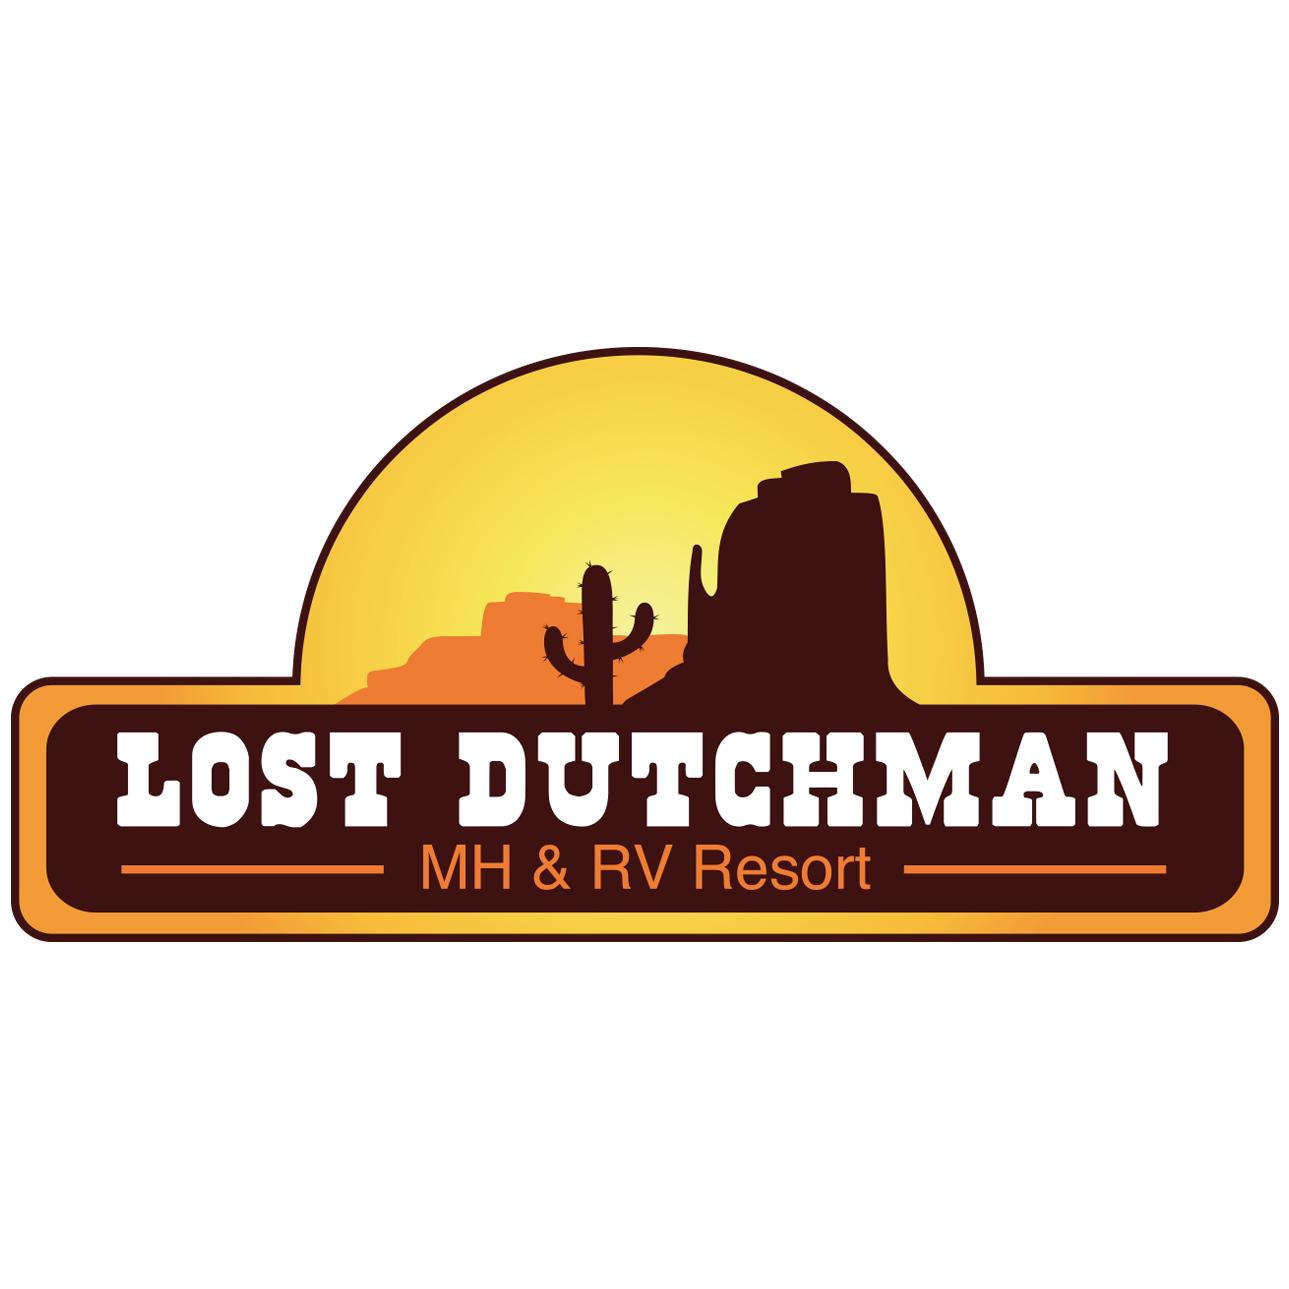 Lost Dutchman MH & RV Resort